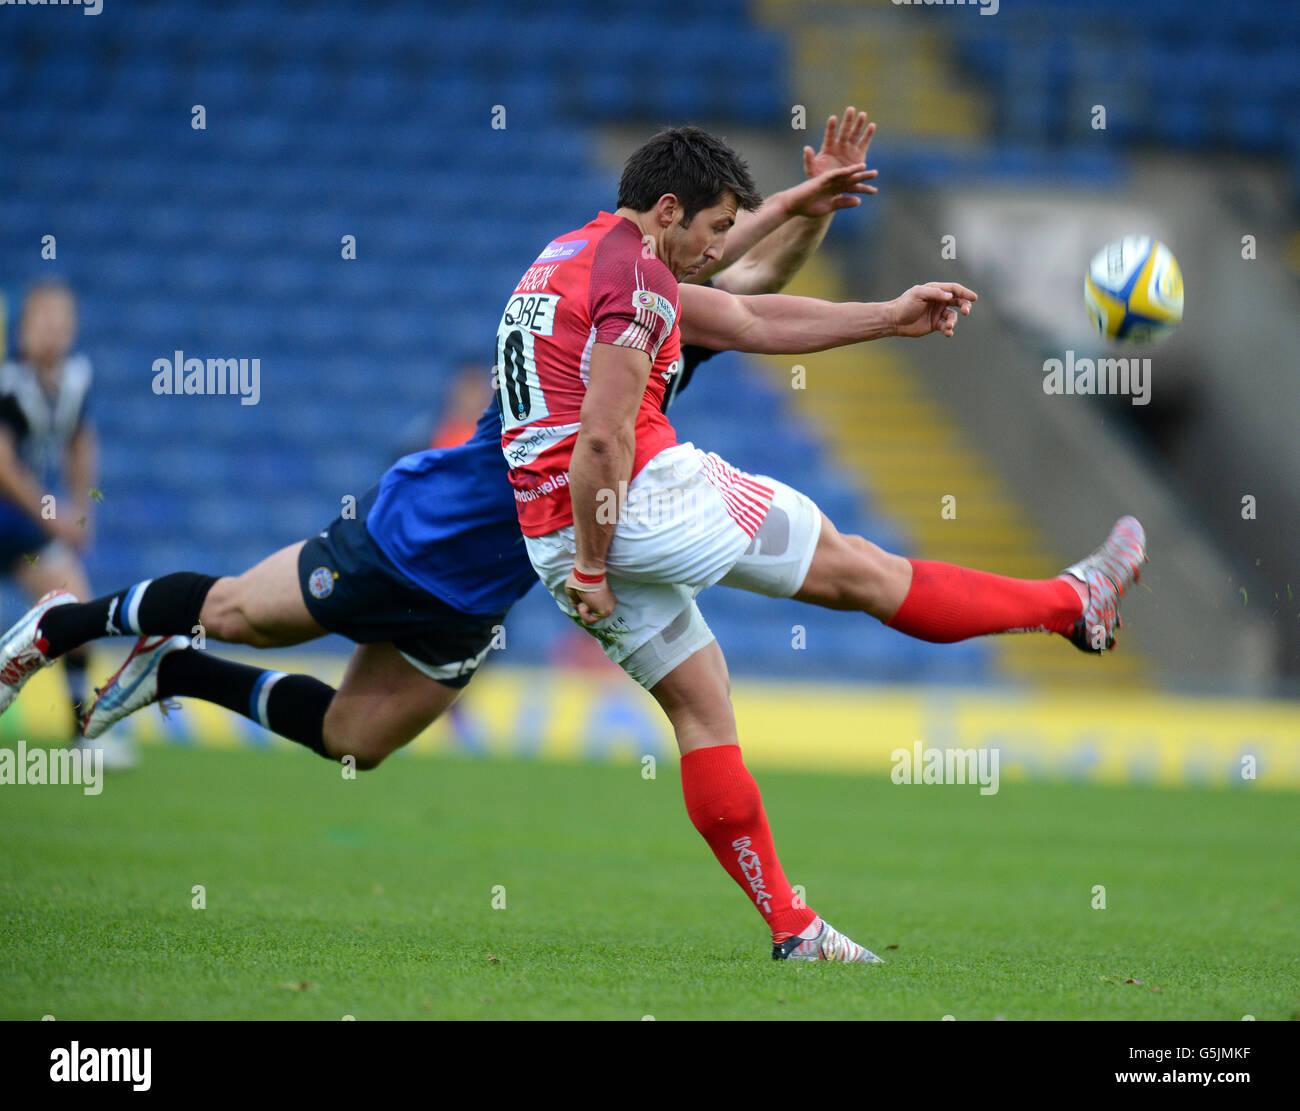 Rugby Union - Aviva Premiership - London Welsh v Bath Rugby - Kassam Stadium - Stock Image